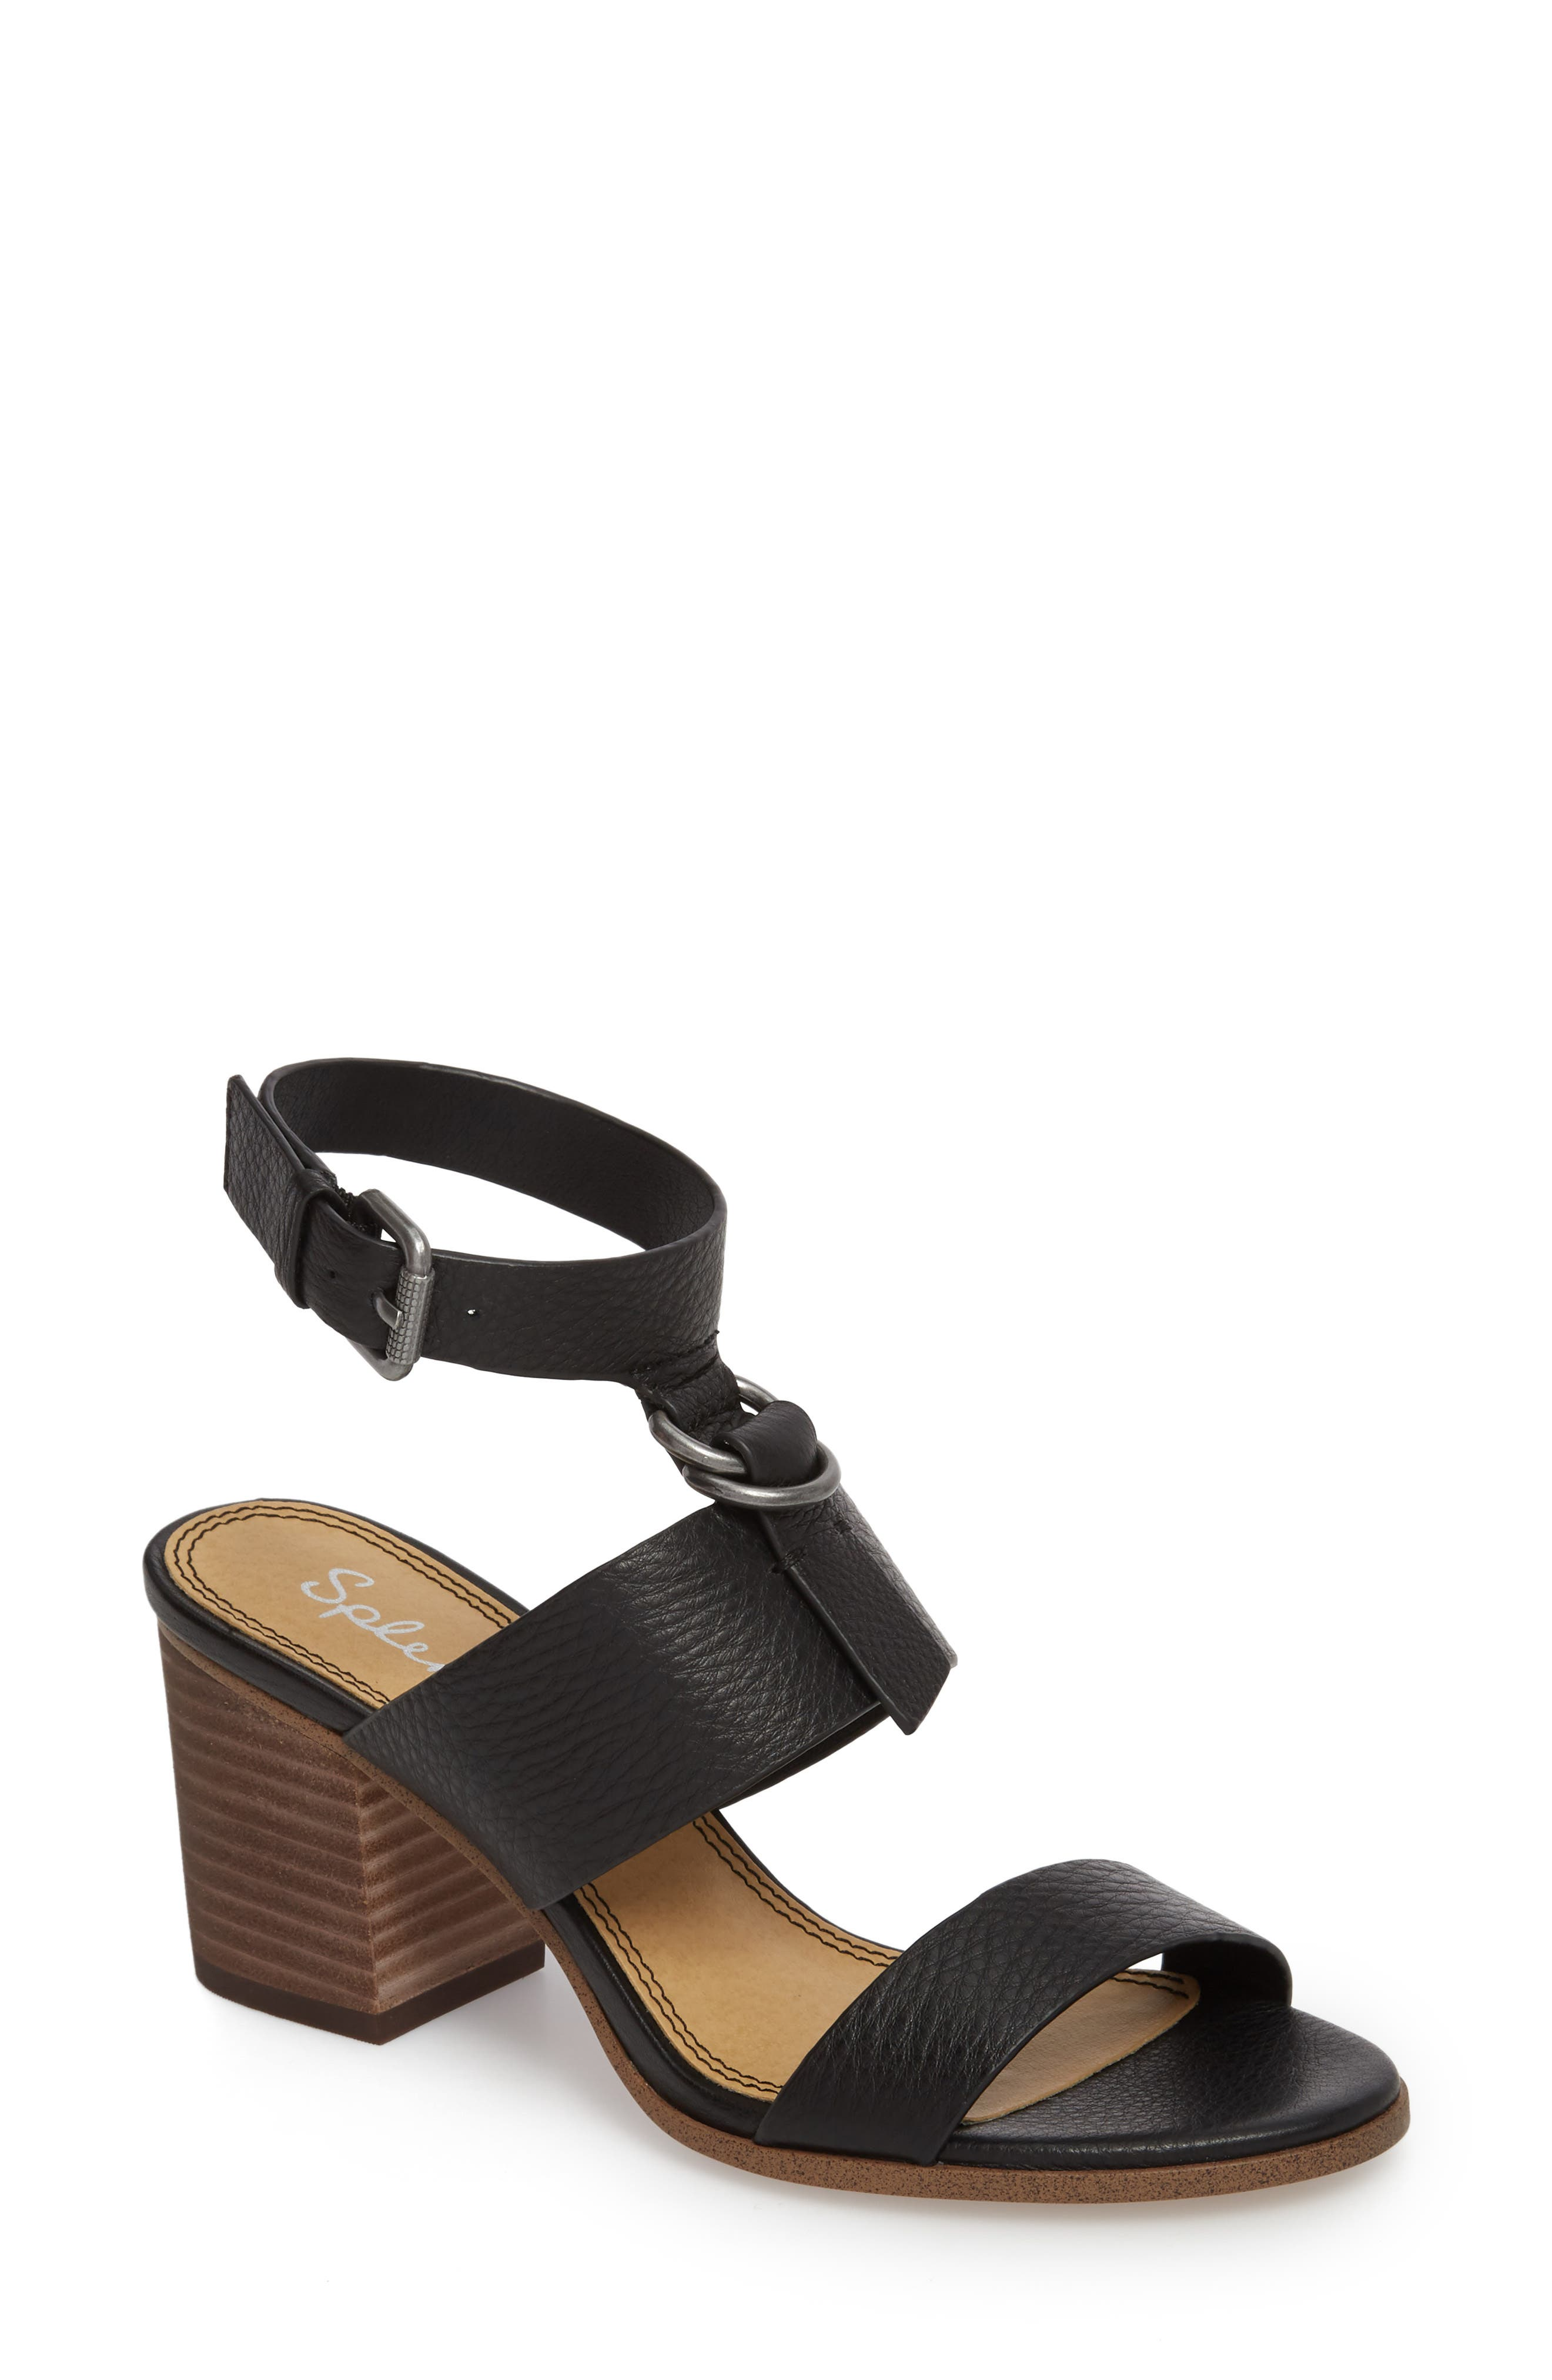 Faron Block Heel Sandal,                             Main thumbnail 1, color,